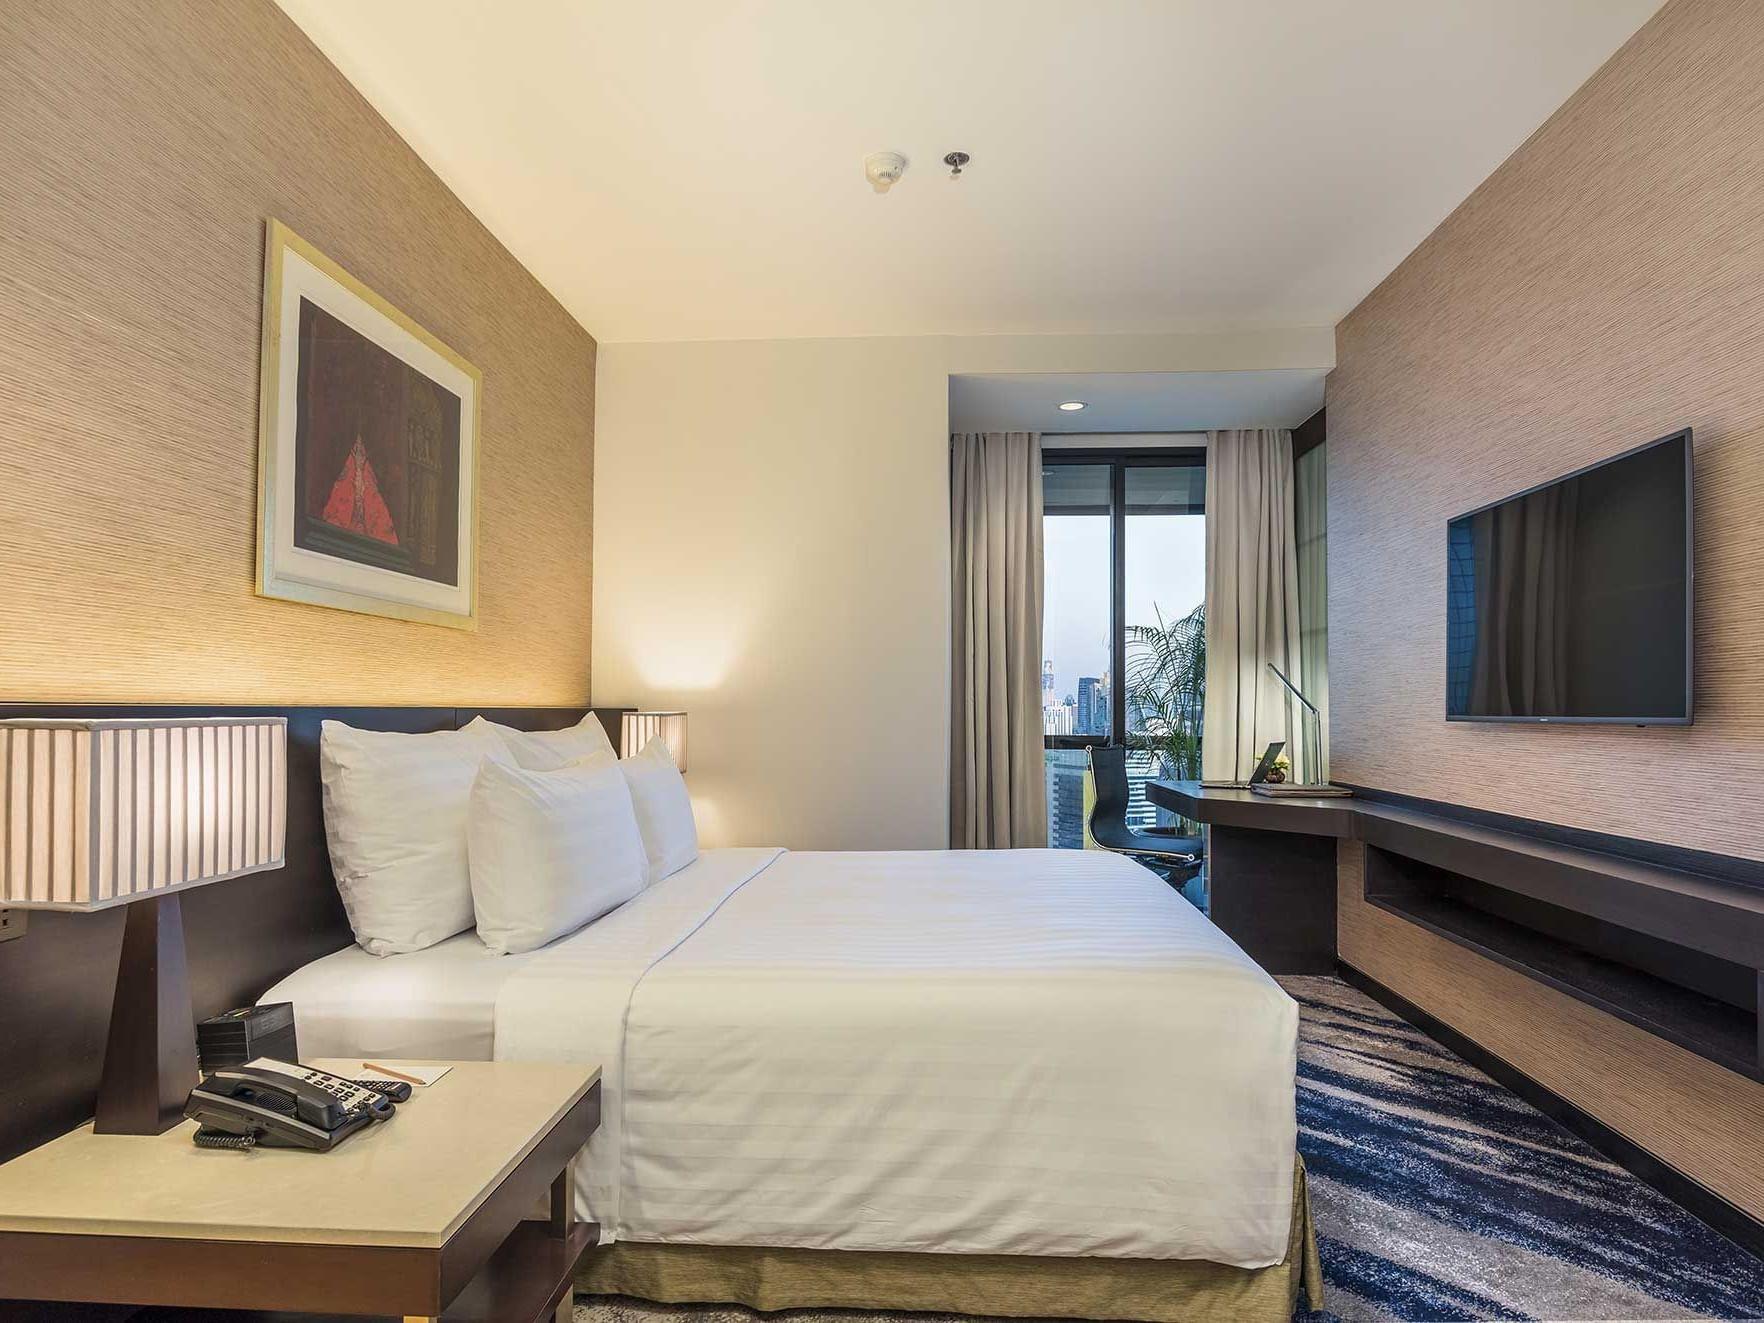 Three bed deluxe suite city view at Emporium suites by Chatrium